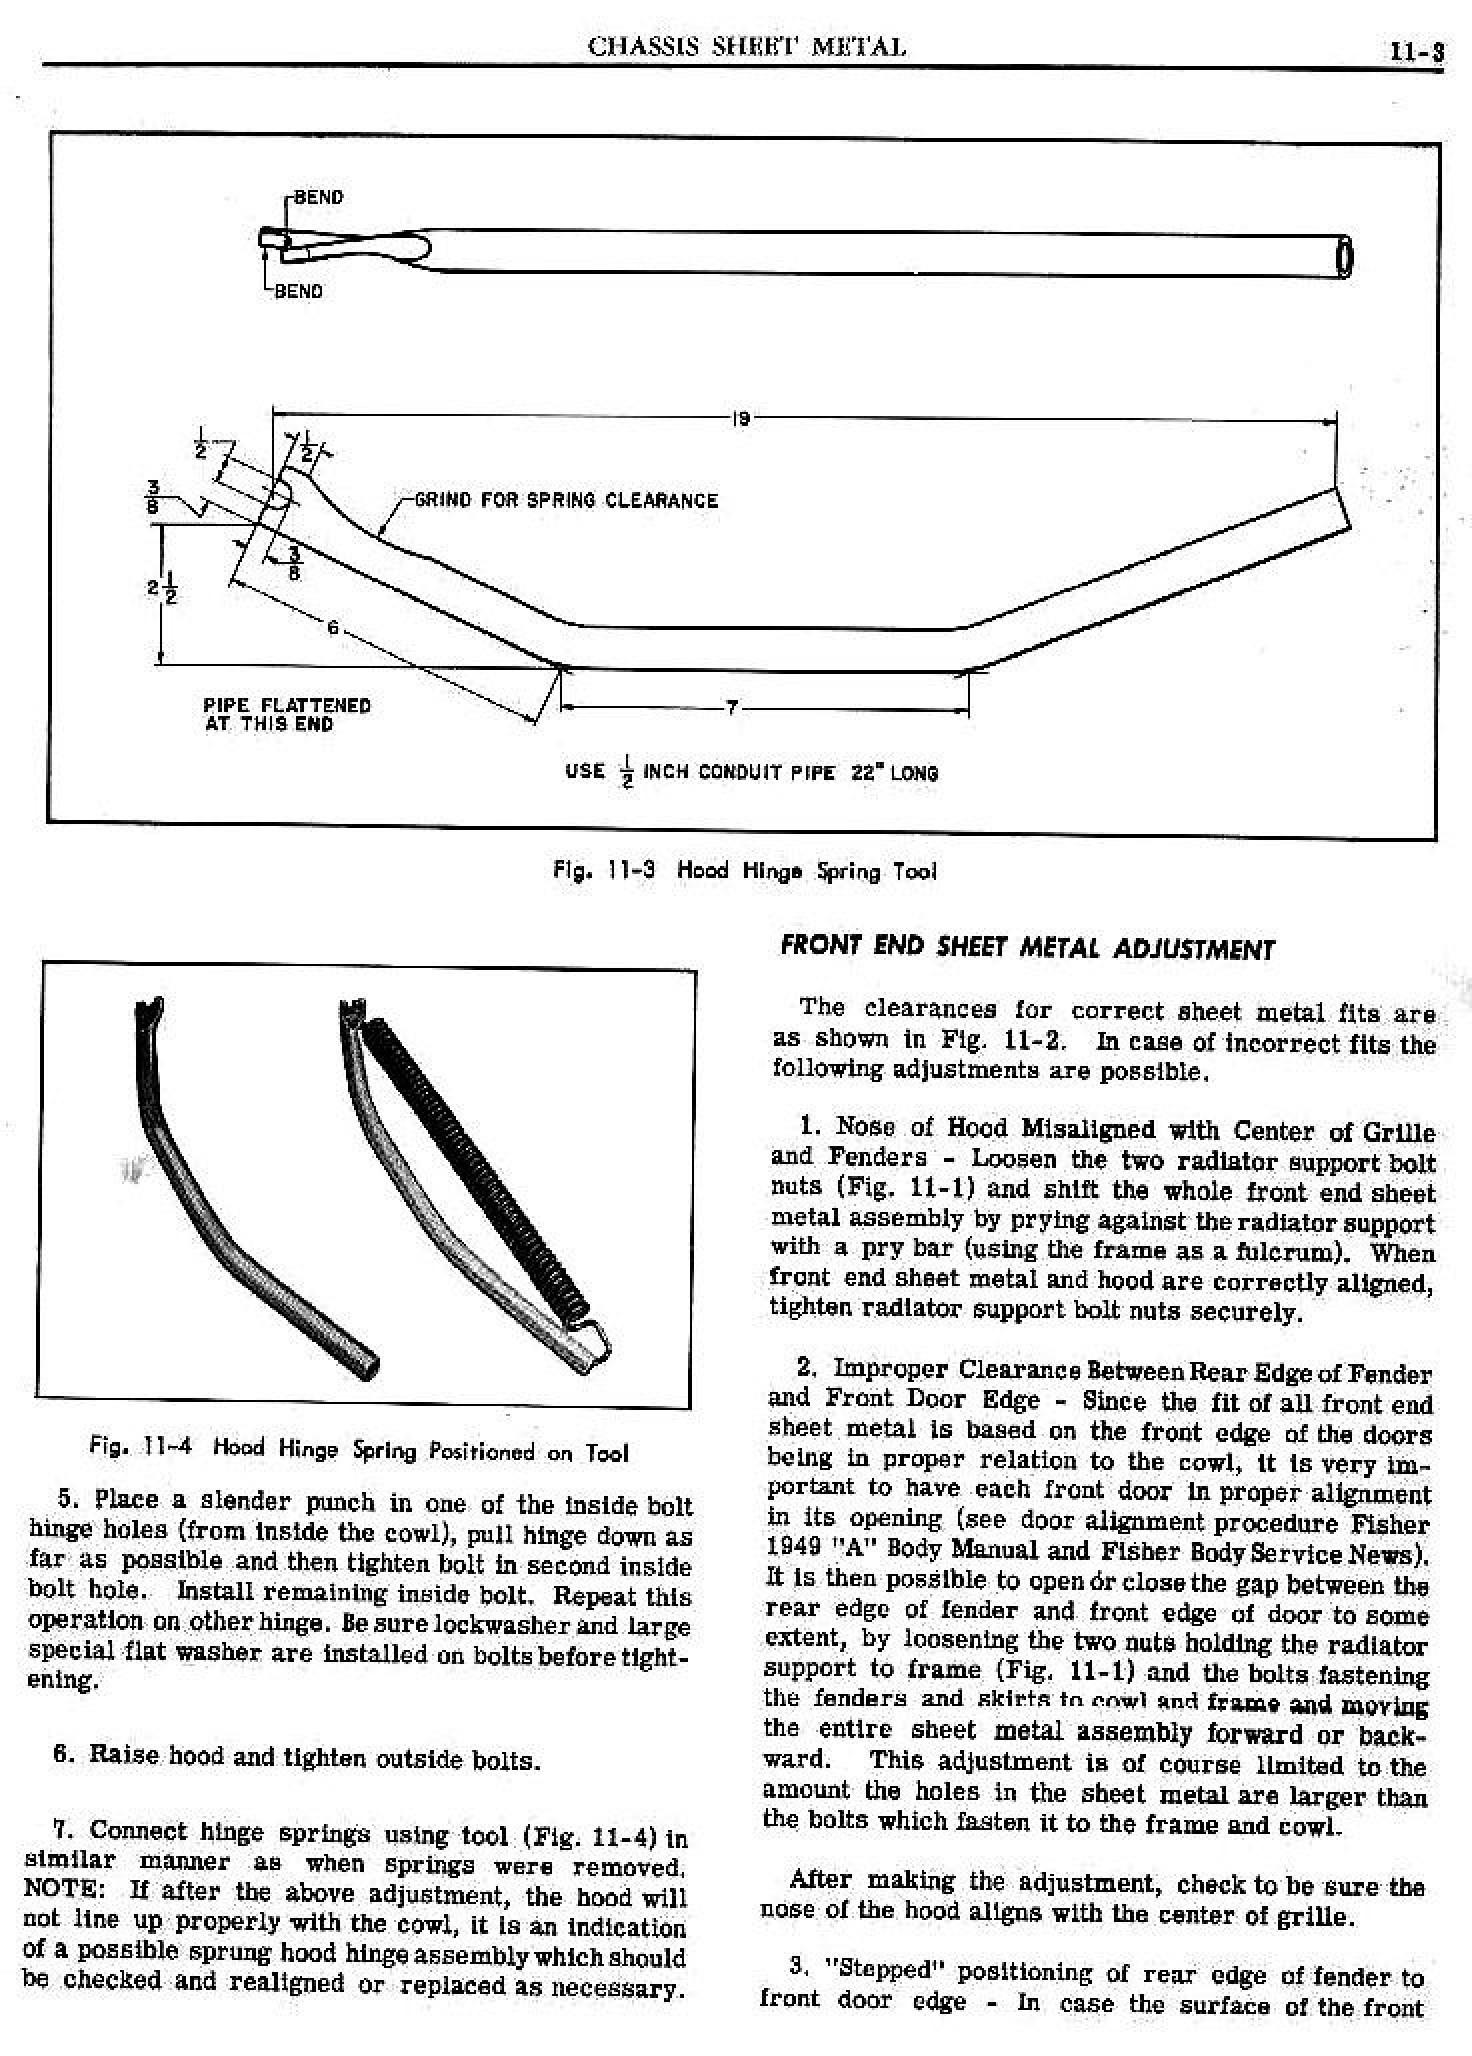 1949 Pontiac Shop Manual- Chassis Sheet Metal Page 3 of 6